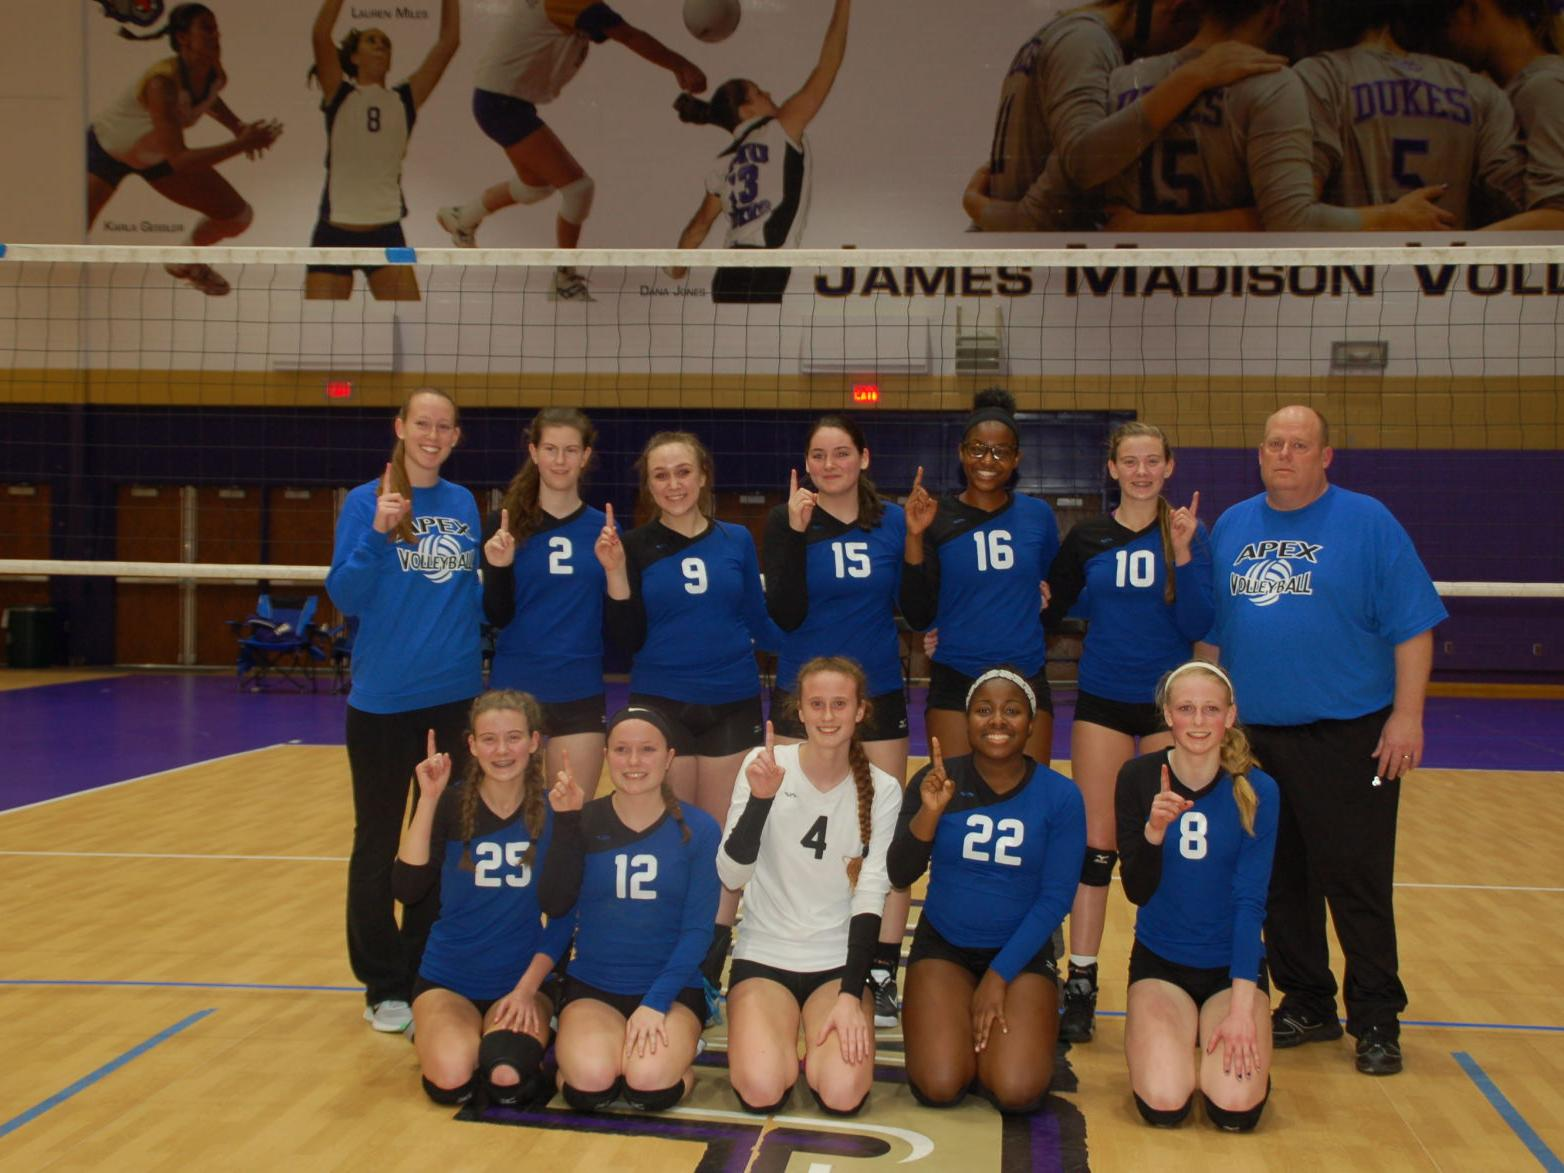 Apex Volleyball Club Wins Tournament At James Madison University Sports News Fredericksburg Com